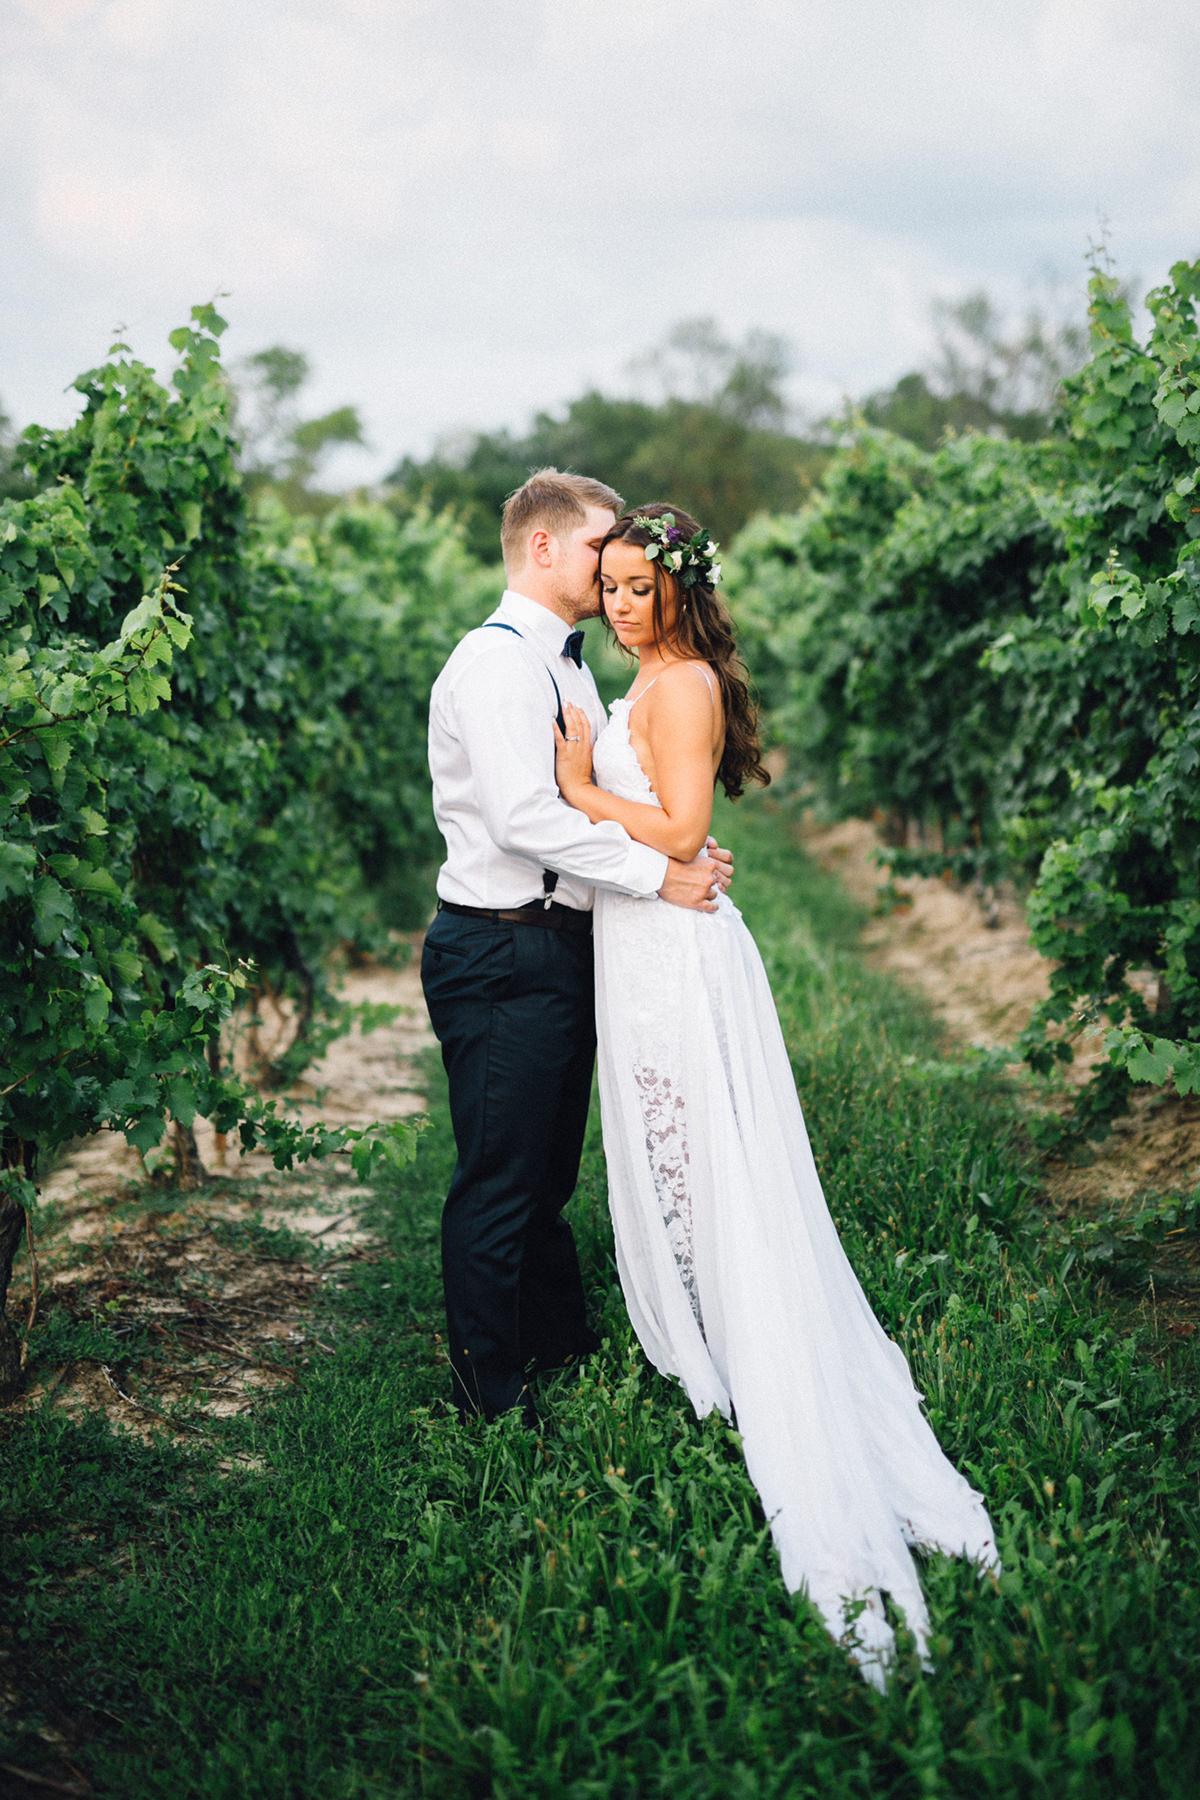 bride and groom photos - - https://ruffledblog.com/chic-niagara-on-the-lake-vineyard-wedding photo Simply Lace